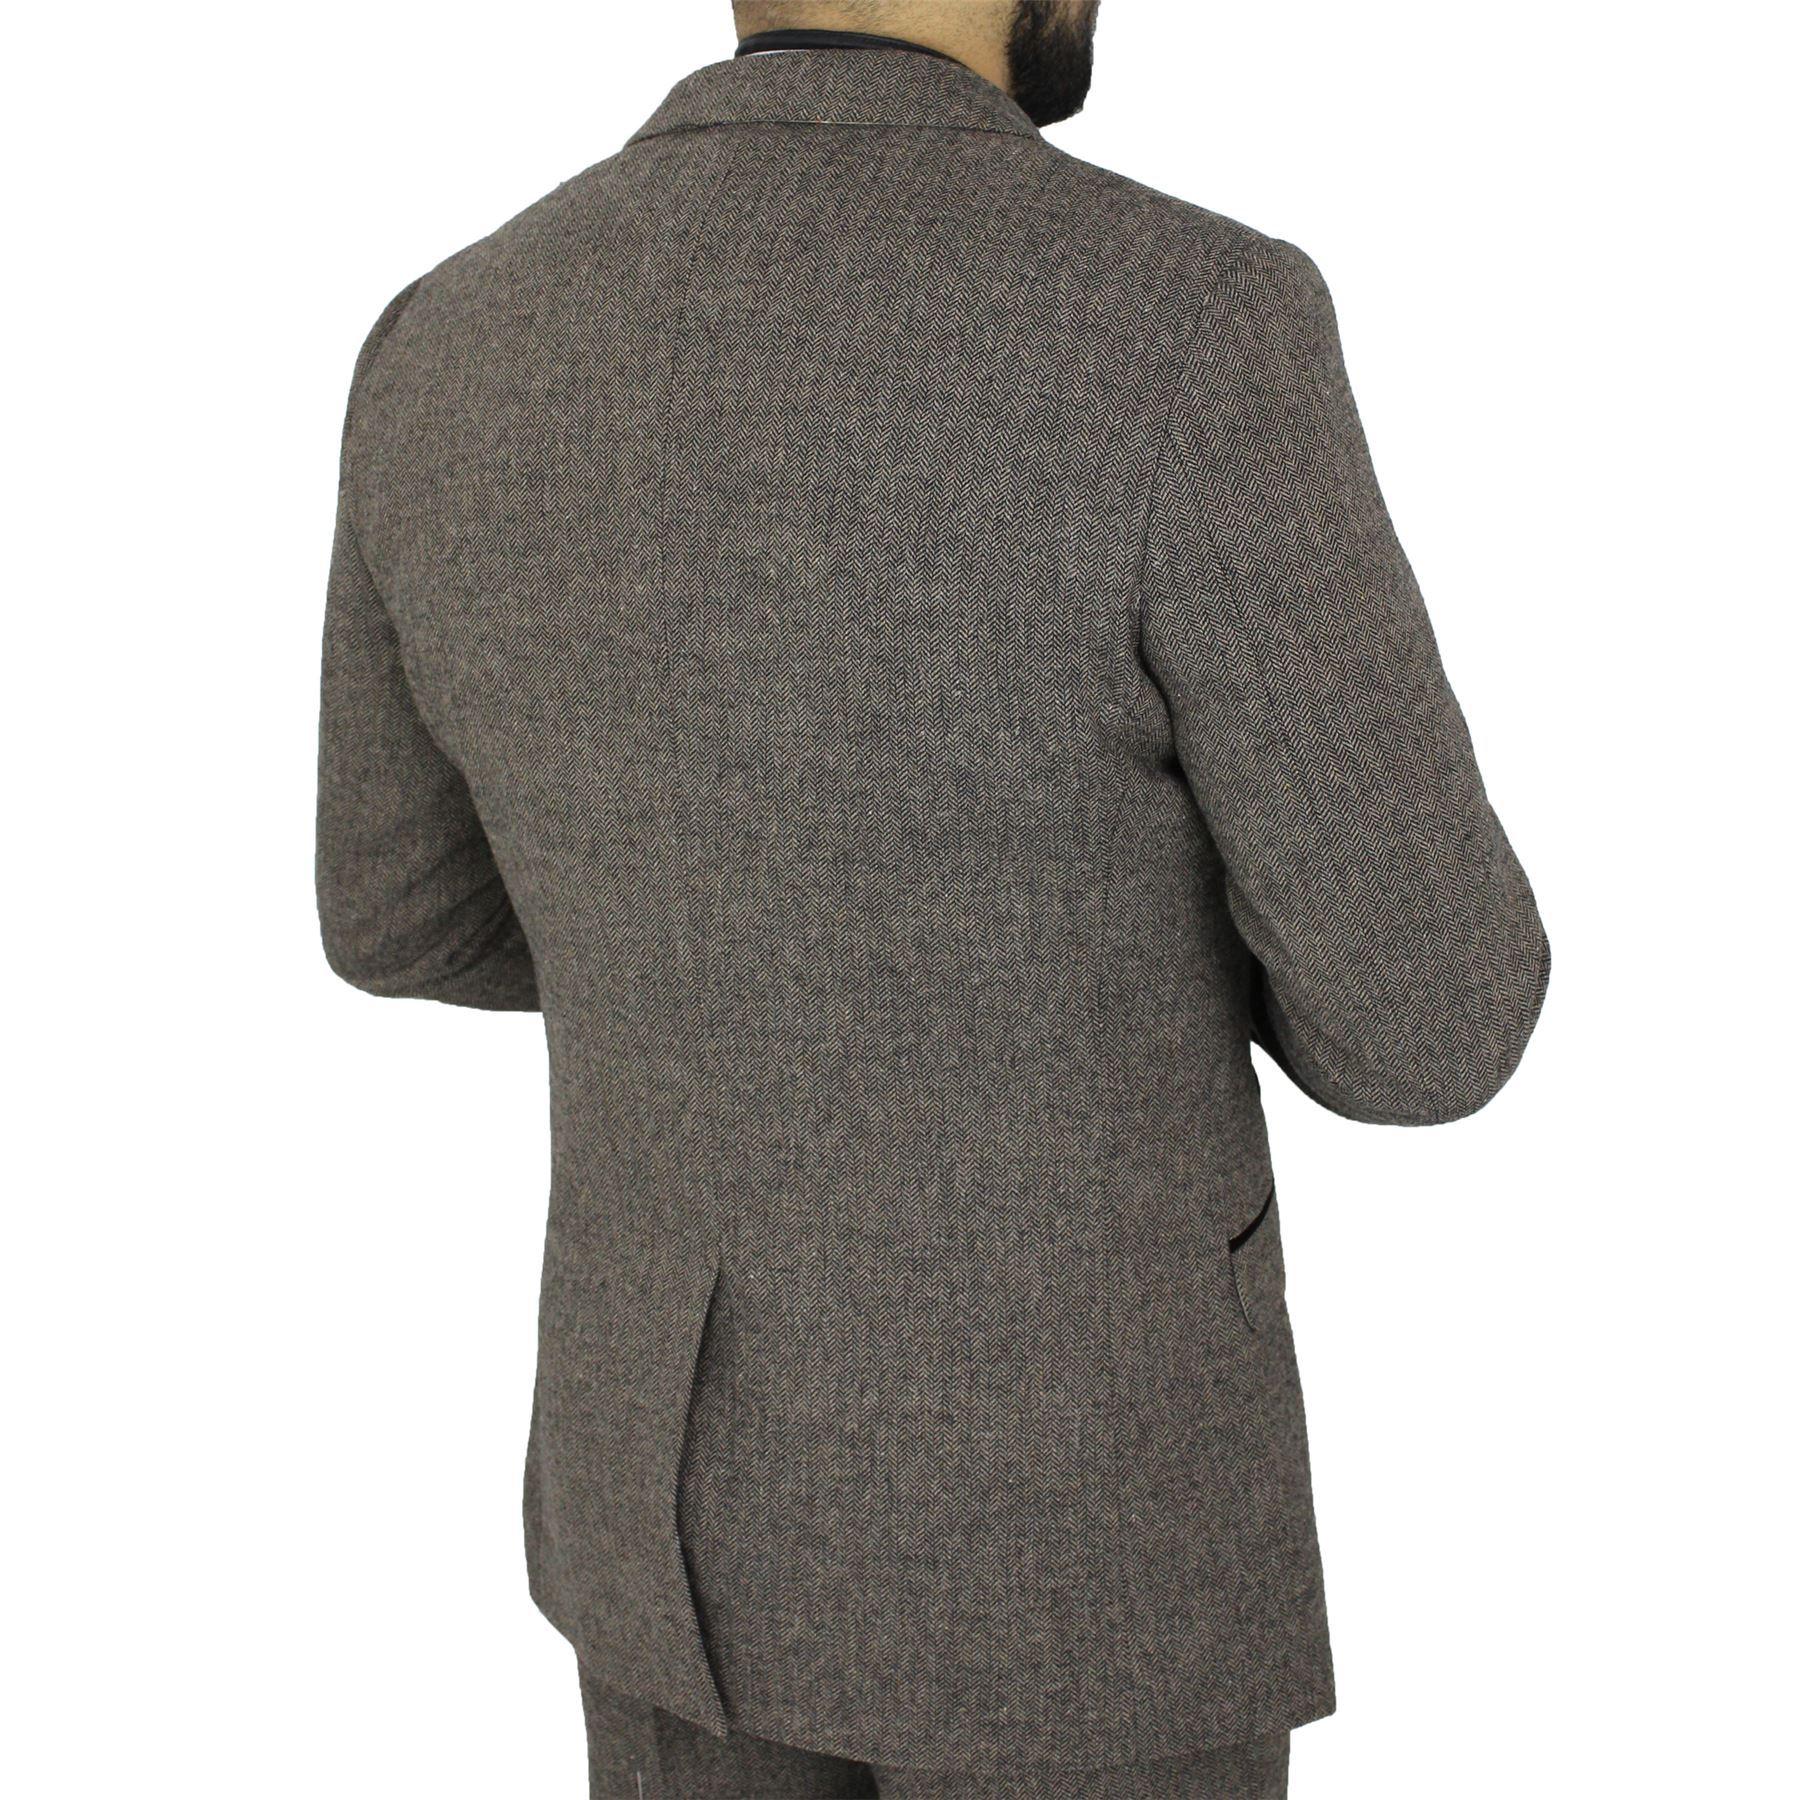 Mens-Cavani-Brown-Tweed-Blazer-Waistcoat-Trouser-3-Piece-Suit-Sold-Separately thumbnail 5